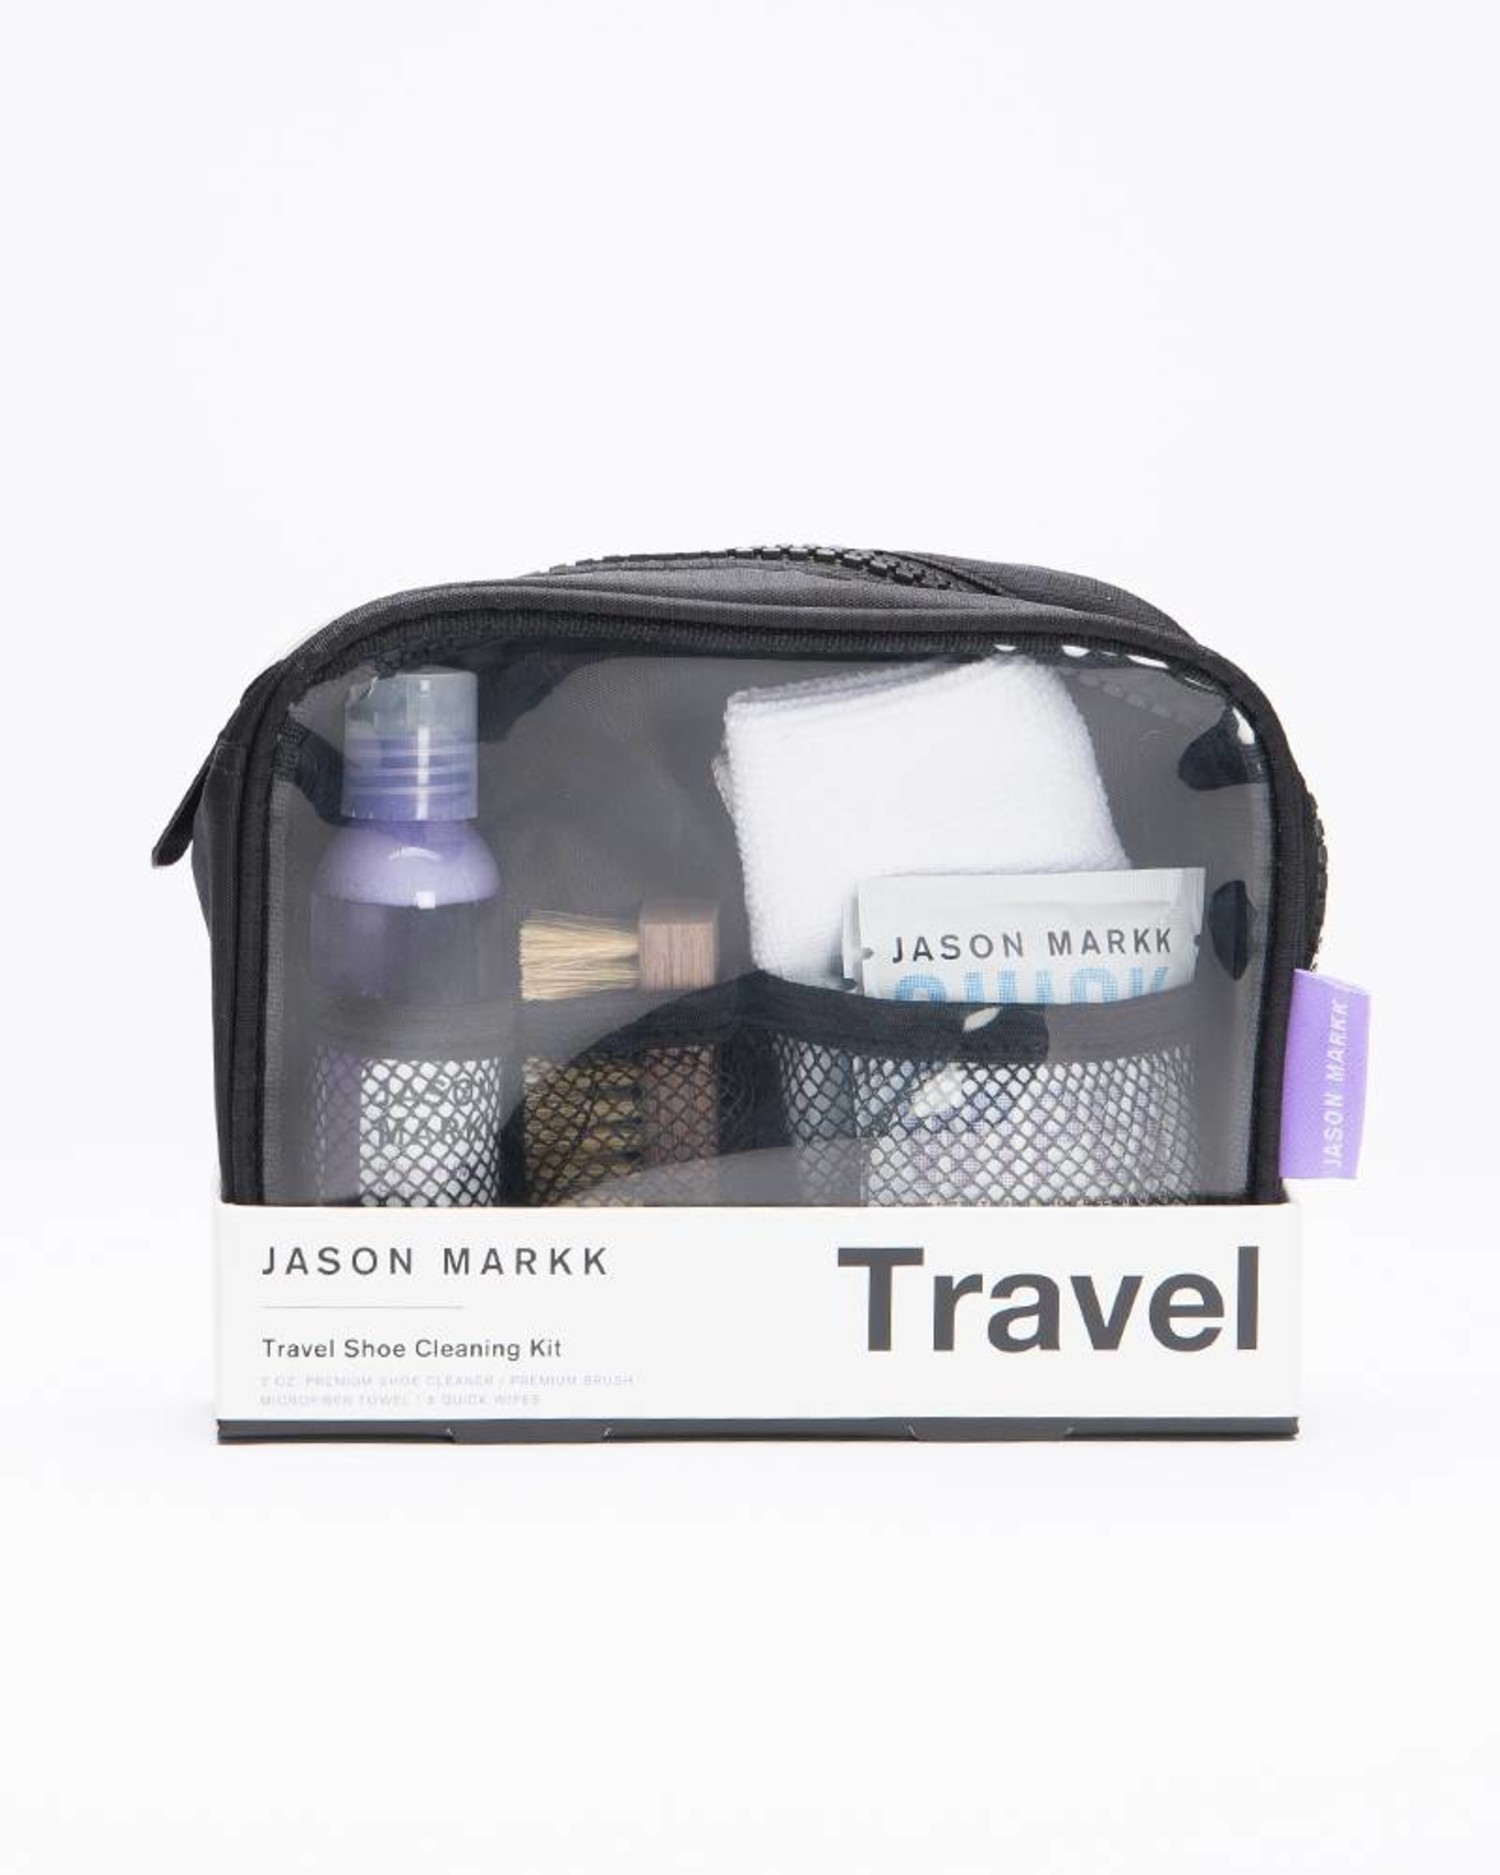 Jason Markk Premium Shoe Cleaning Travelkit in Pouch